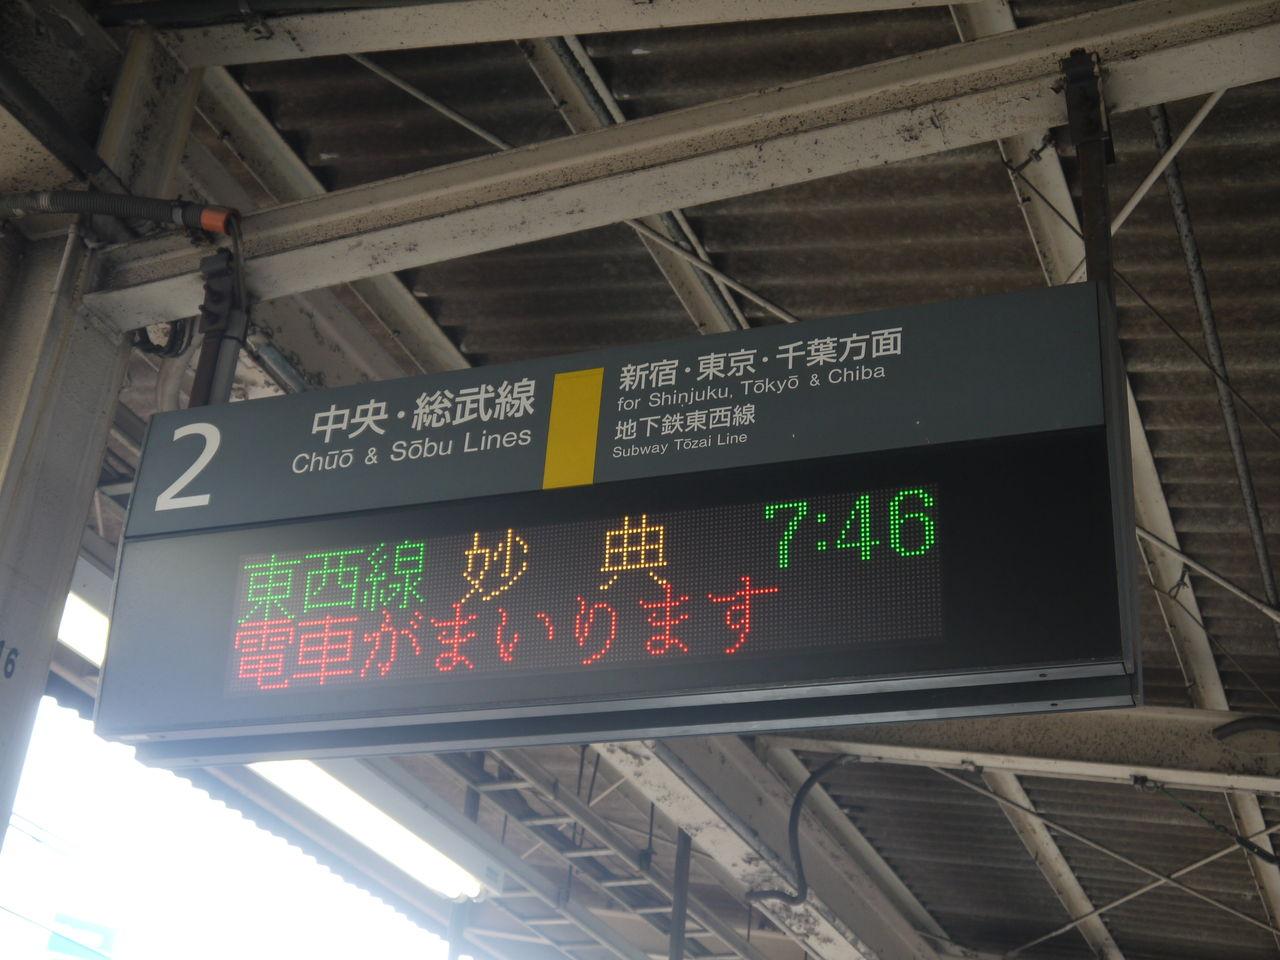 http://livedoor.blogimg.jp/shinkanaoka/imgs/9/7/9716fcf8.jpg